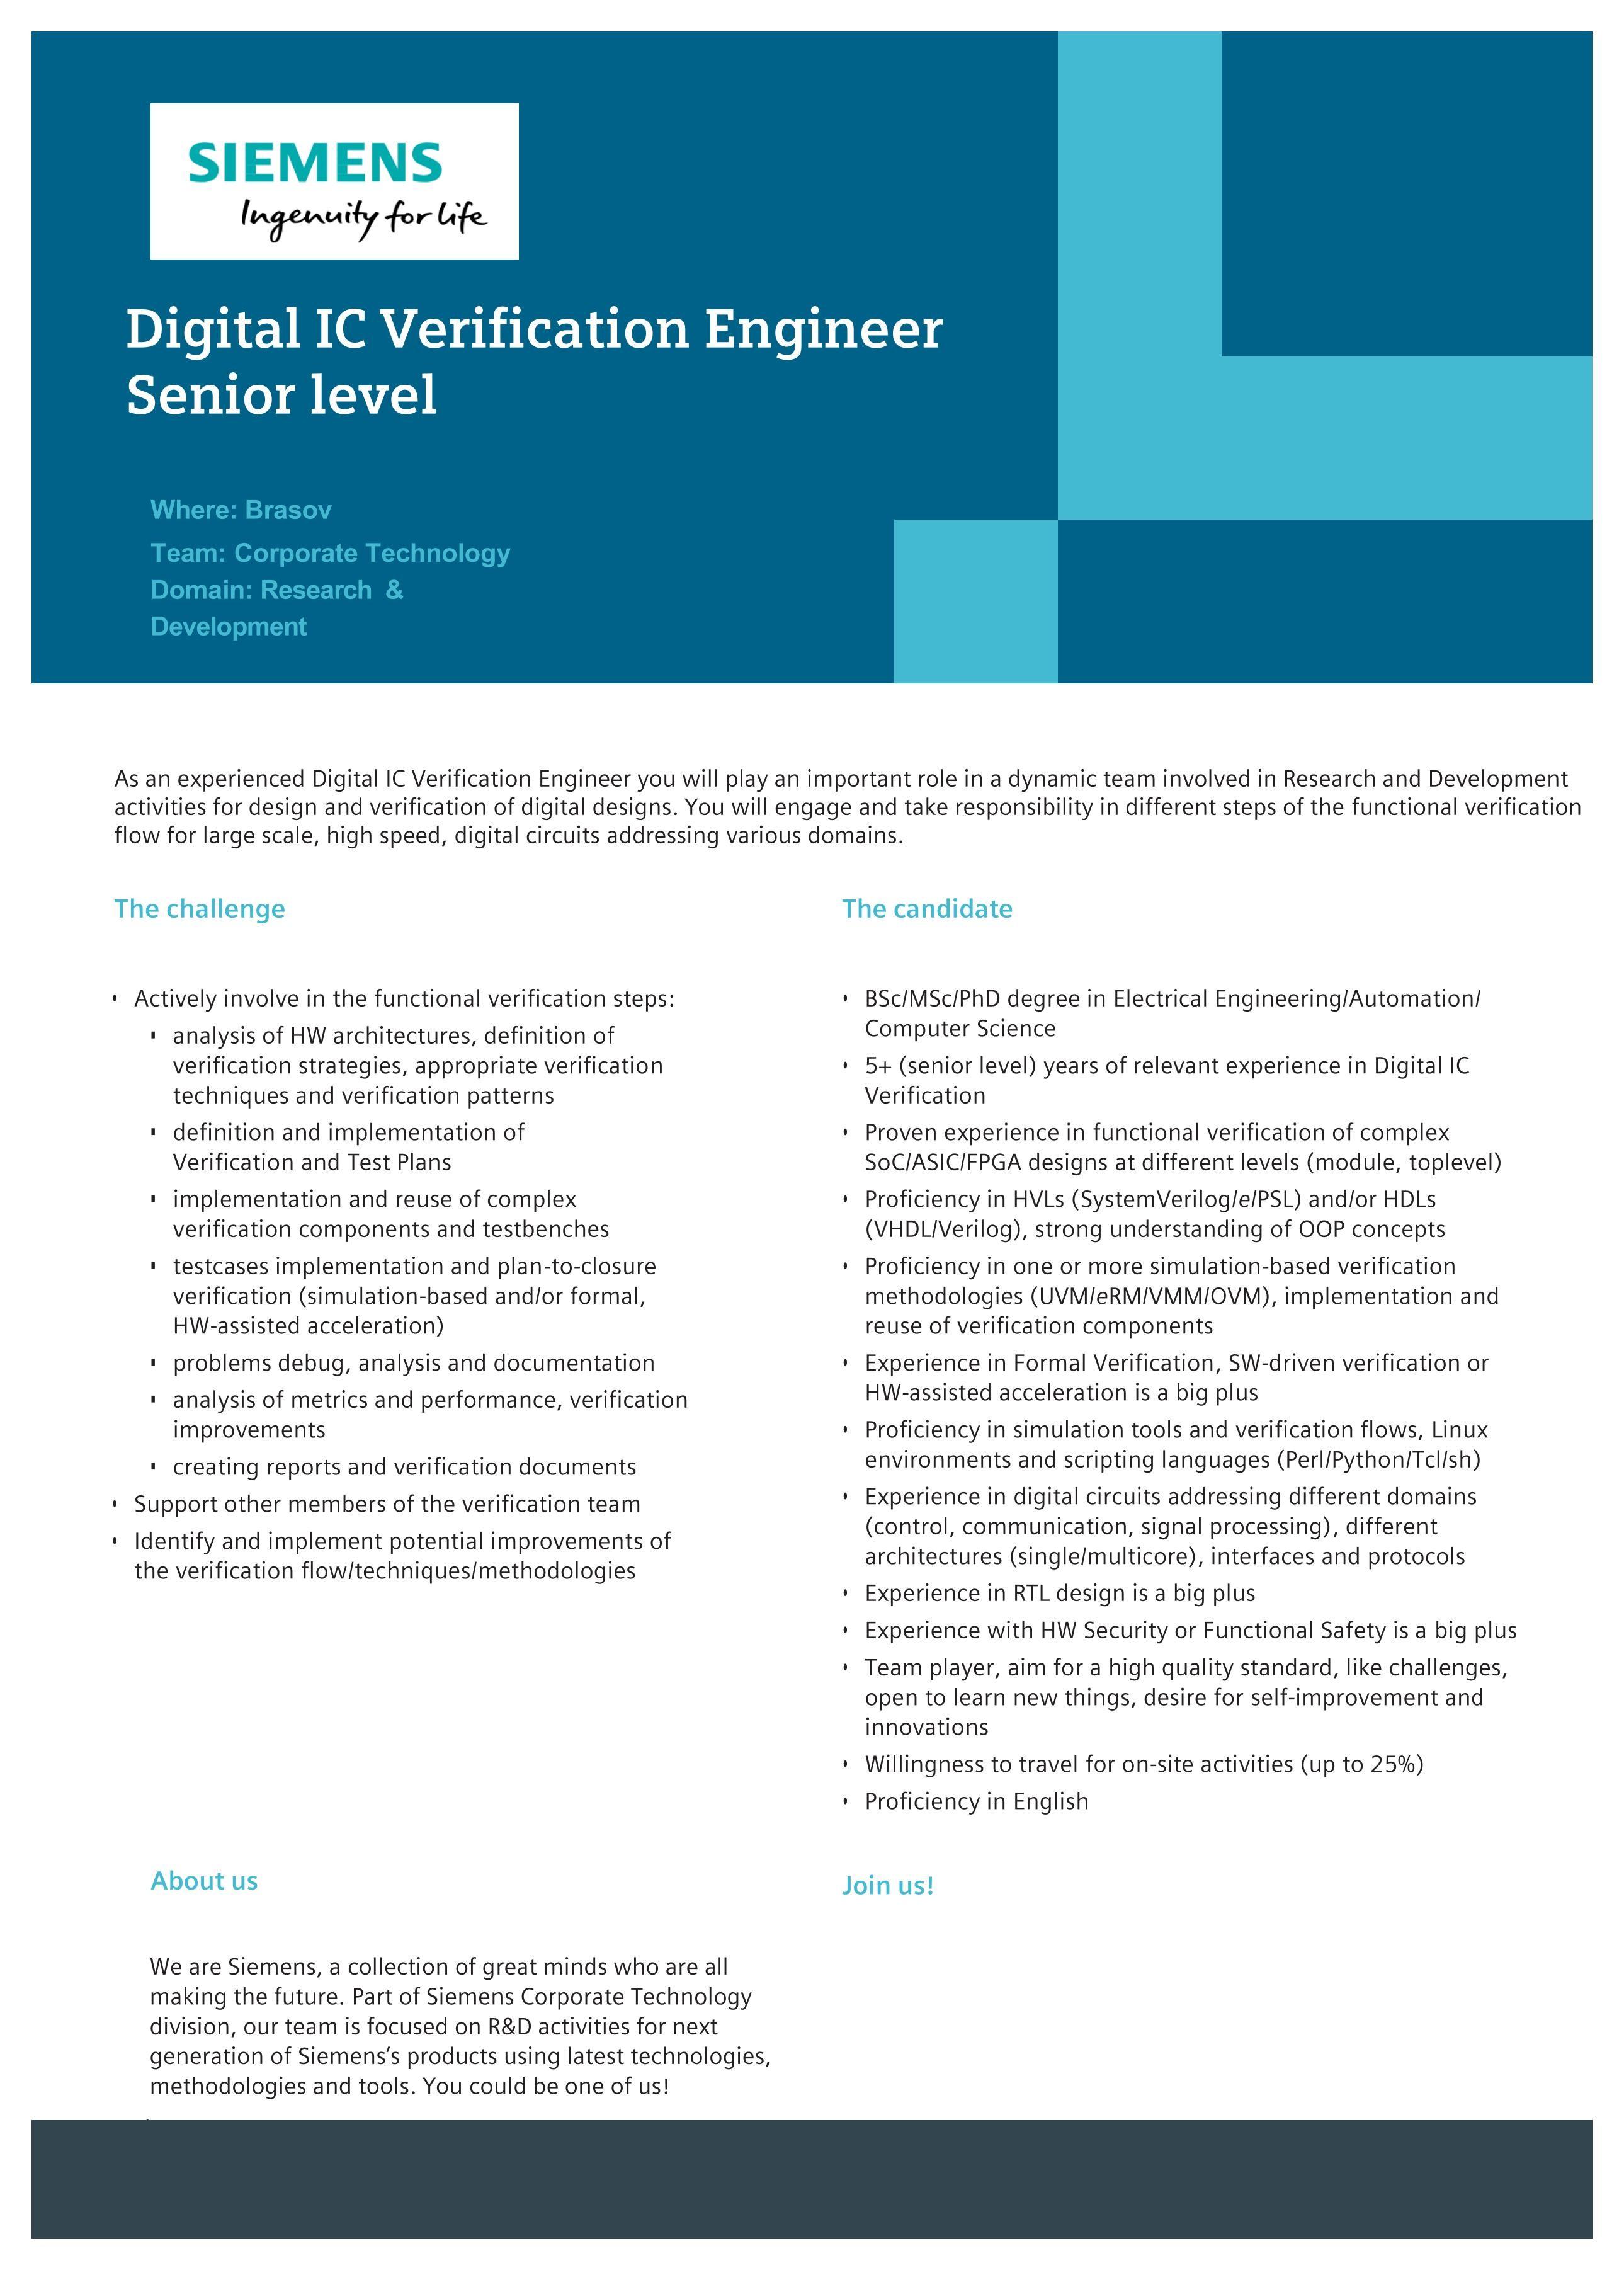 Digital IC Verification Engineer  Senior level 2019